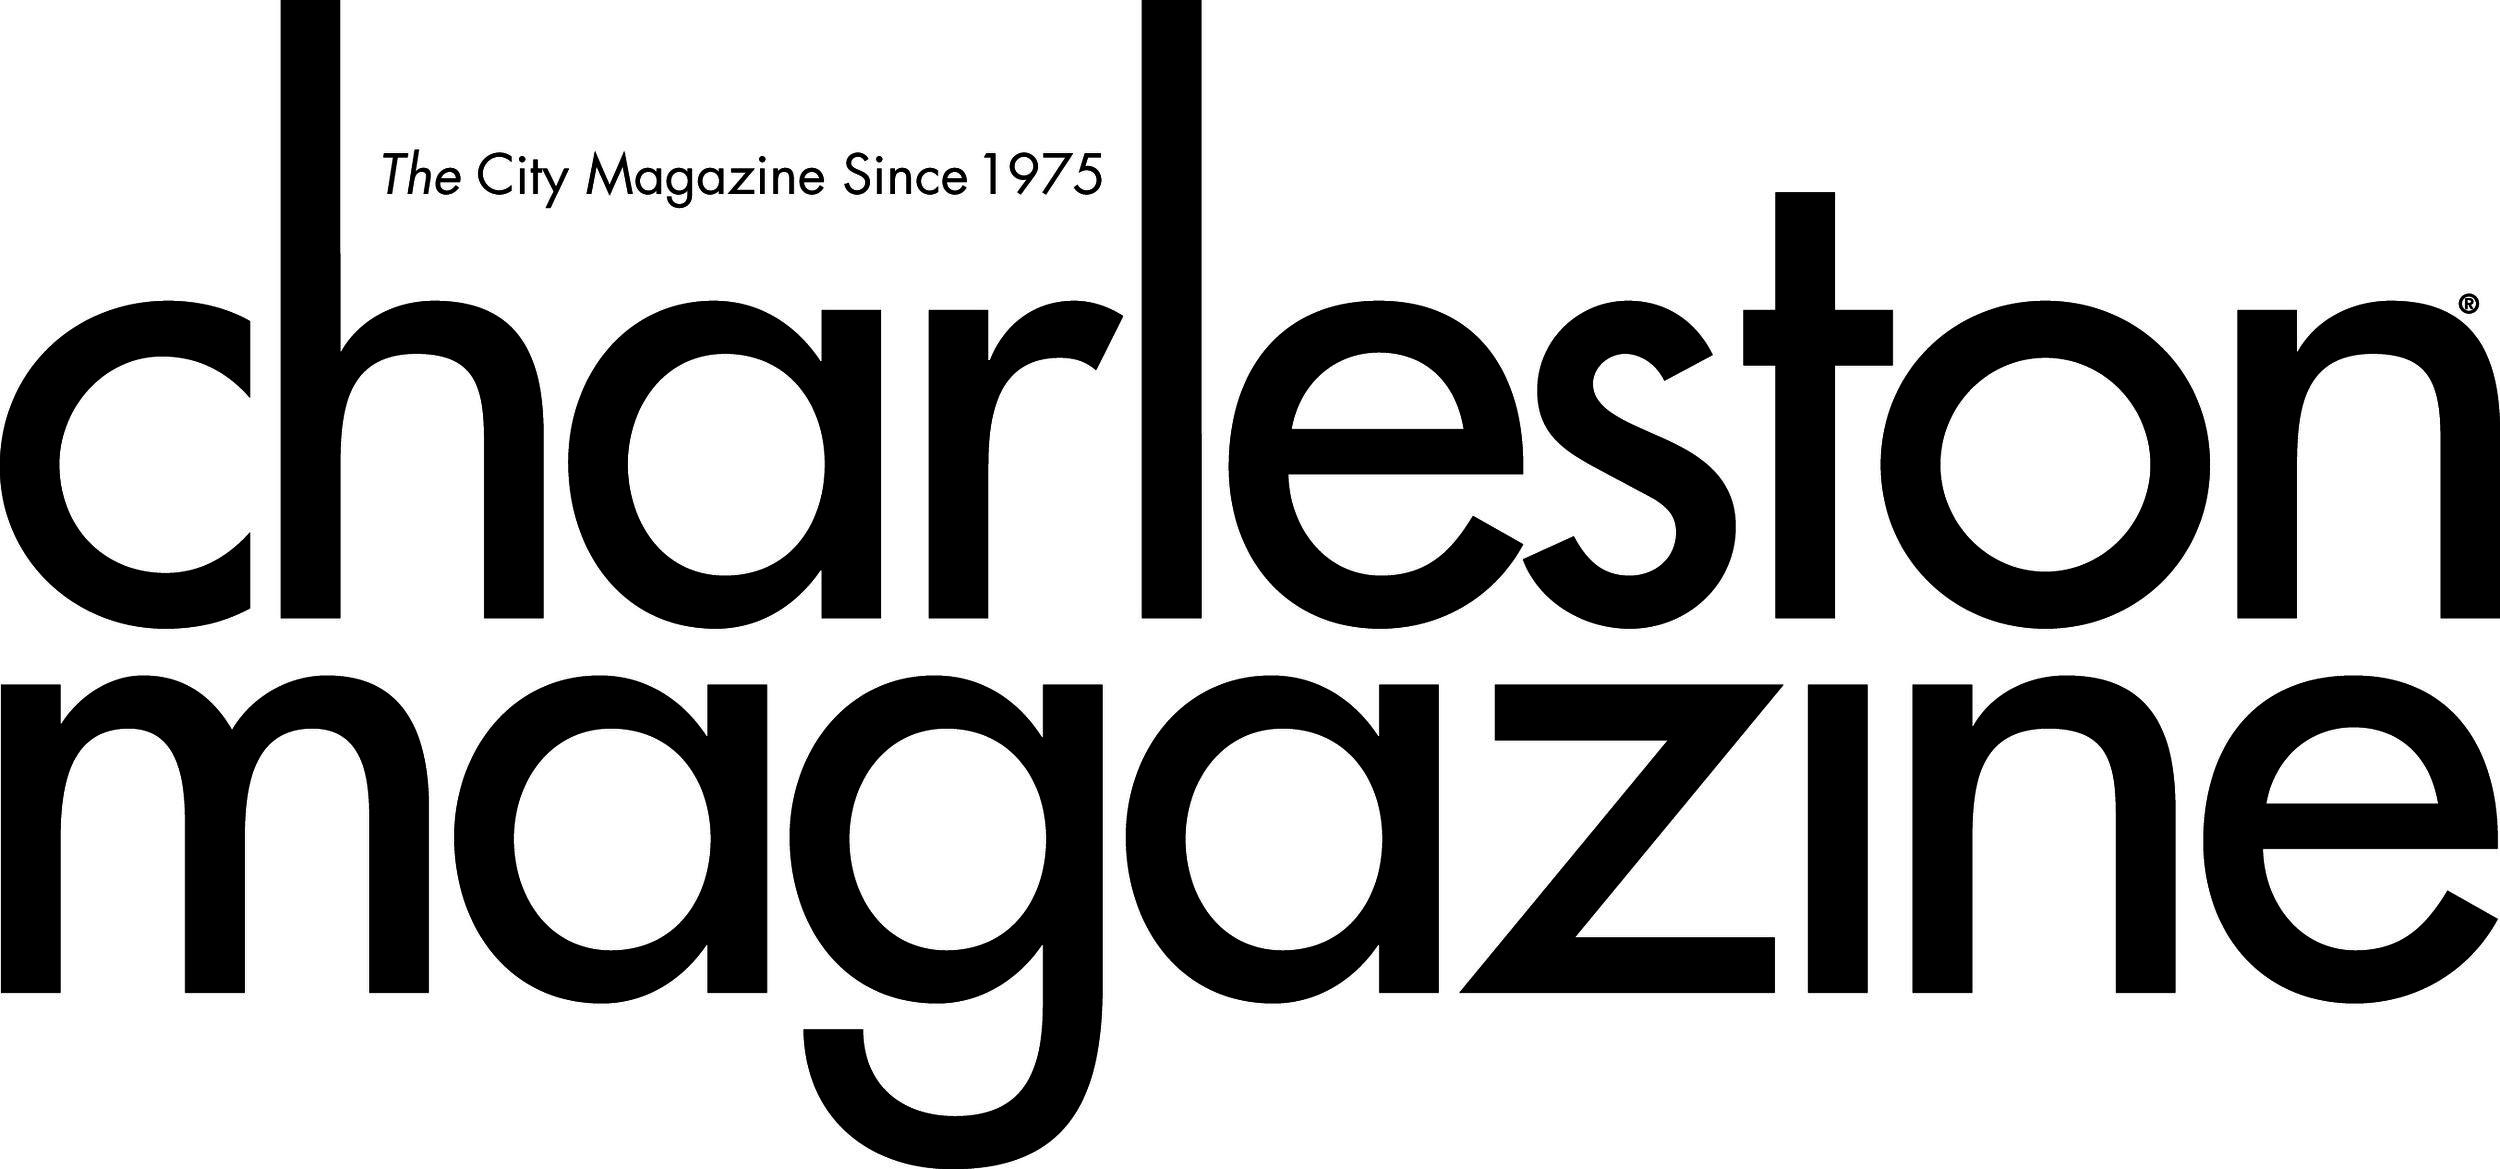 2013 REDESIGN LOGO charleston magazine.jpg